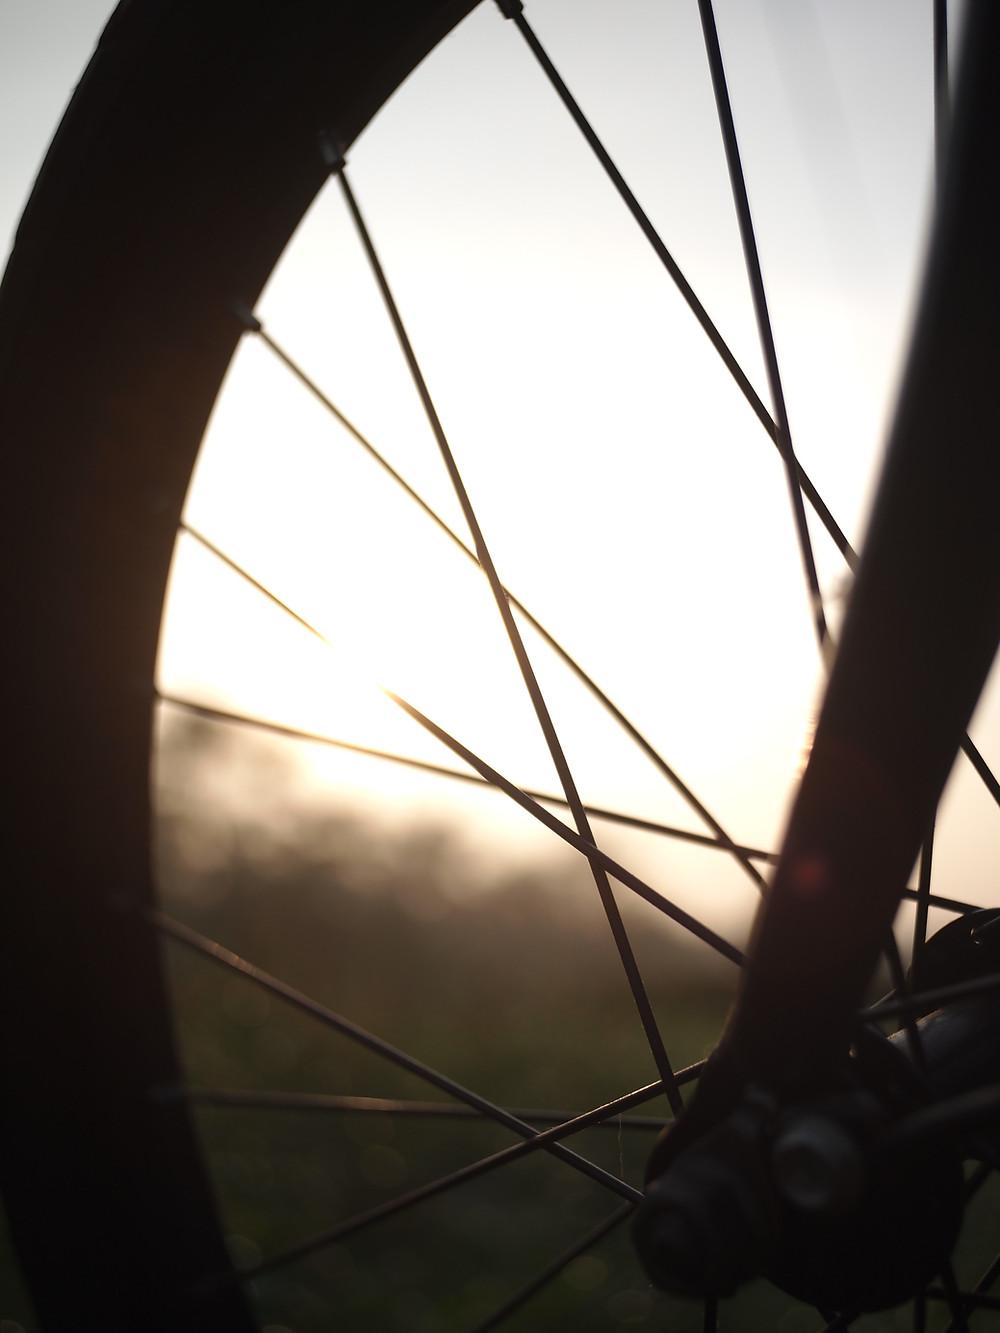 Bike tire, commuters, safety, community